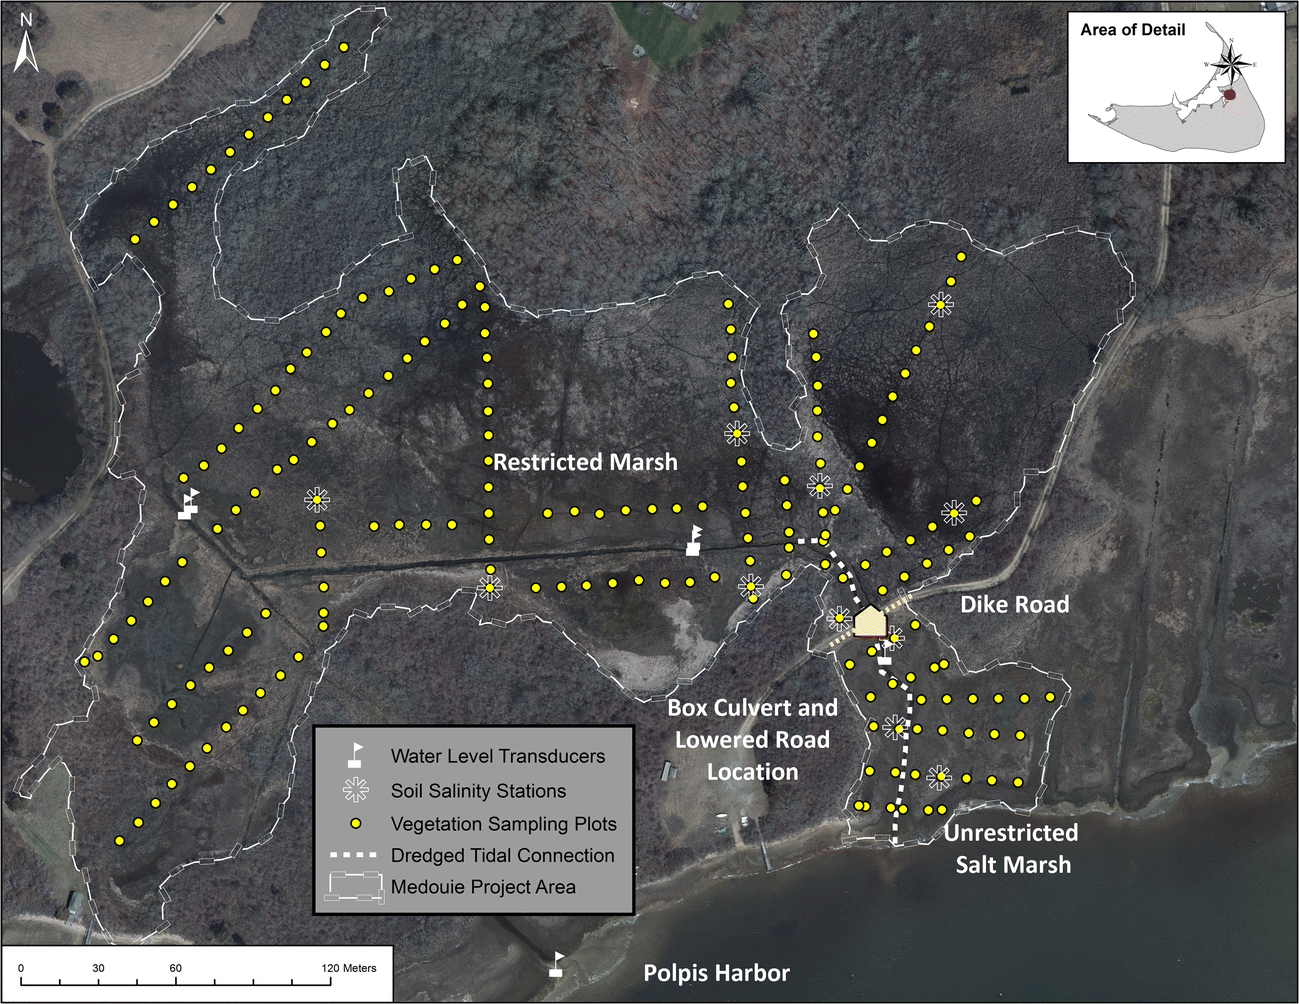 Tidal Hydrology and Salinity Drives Salt Marsh Vegetation